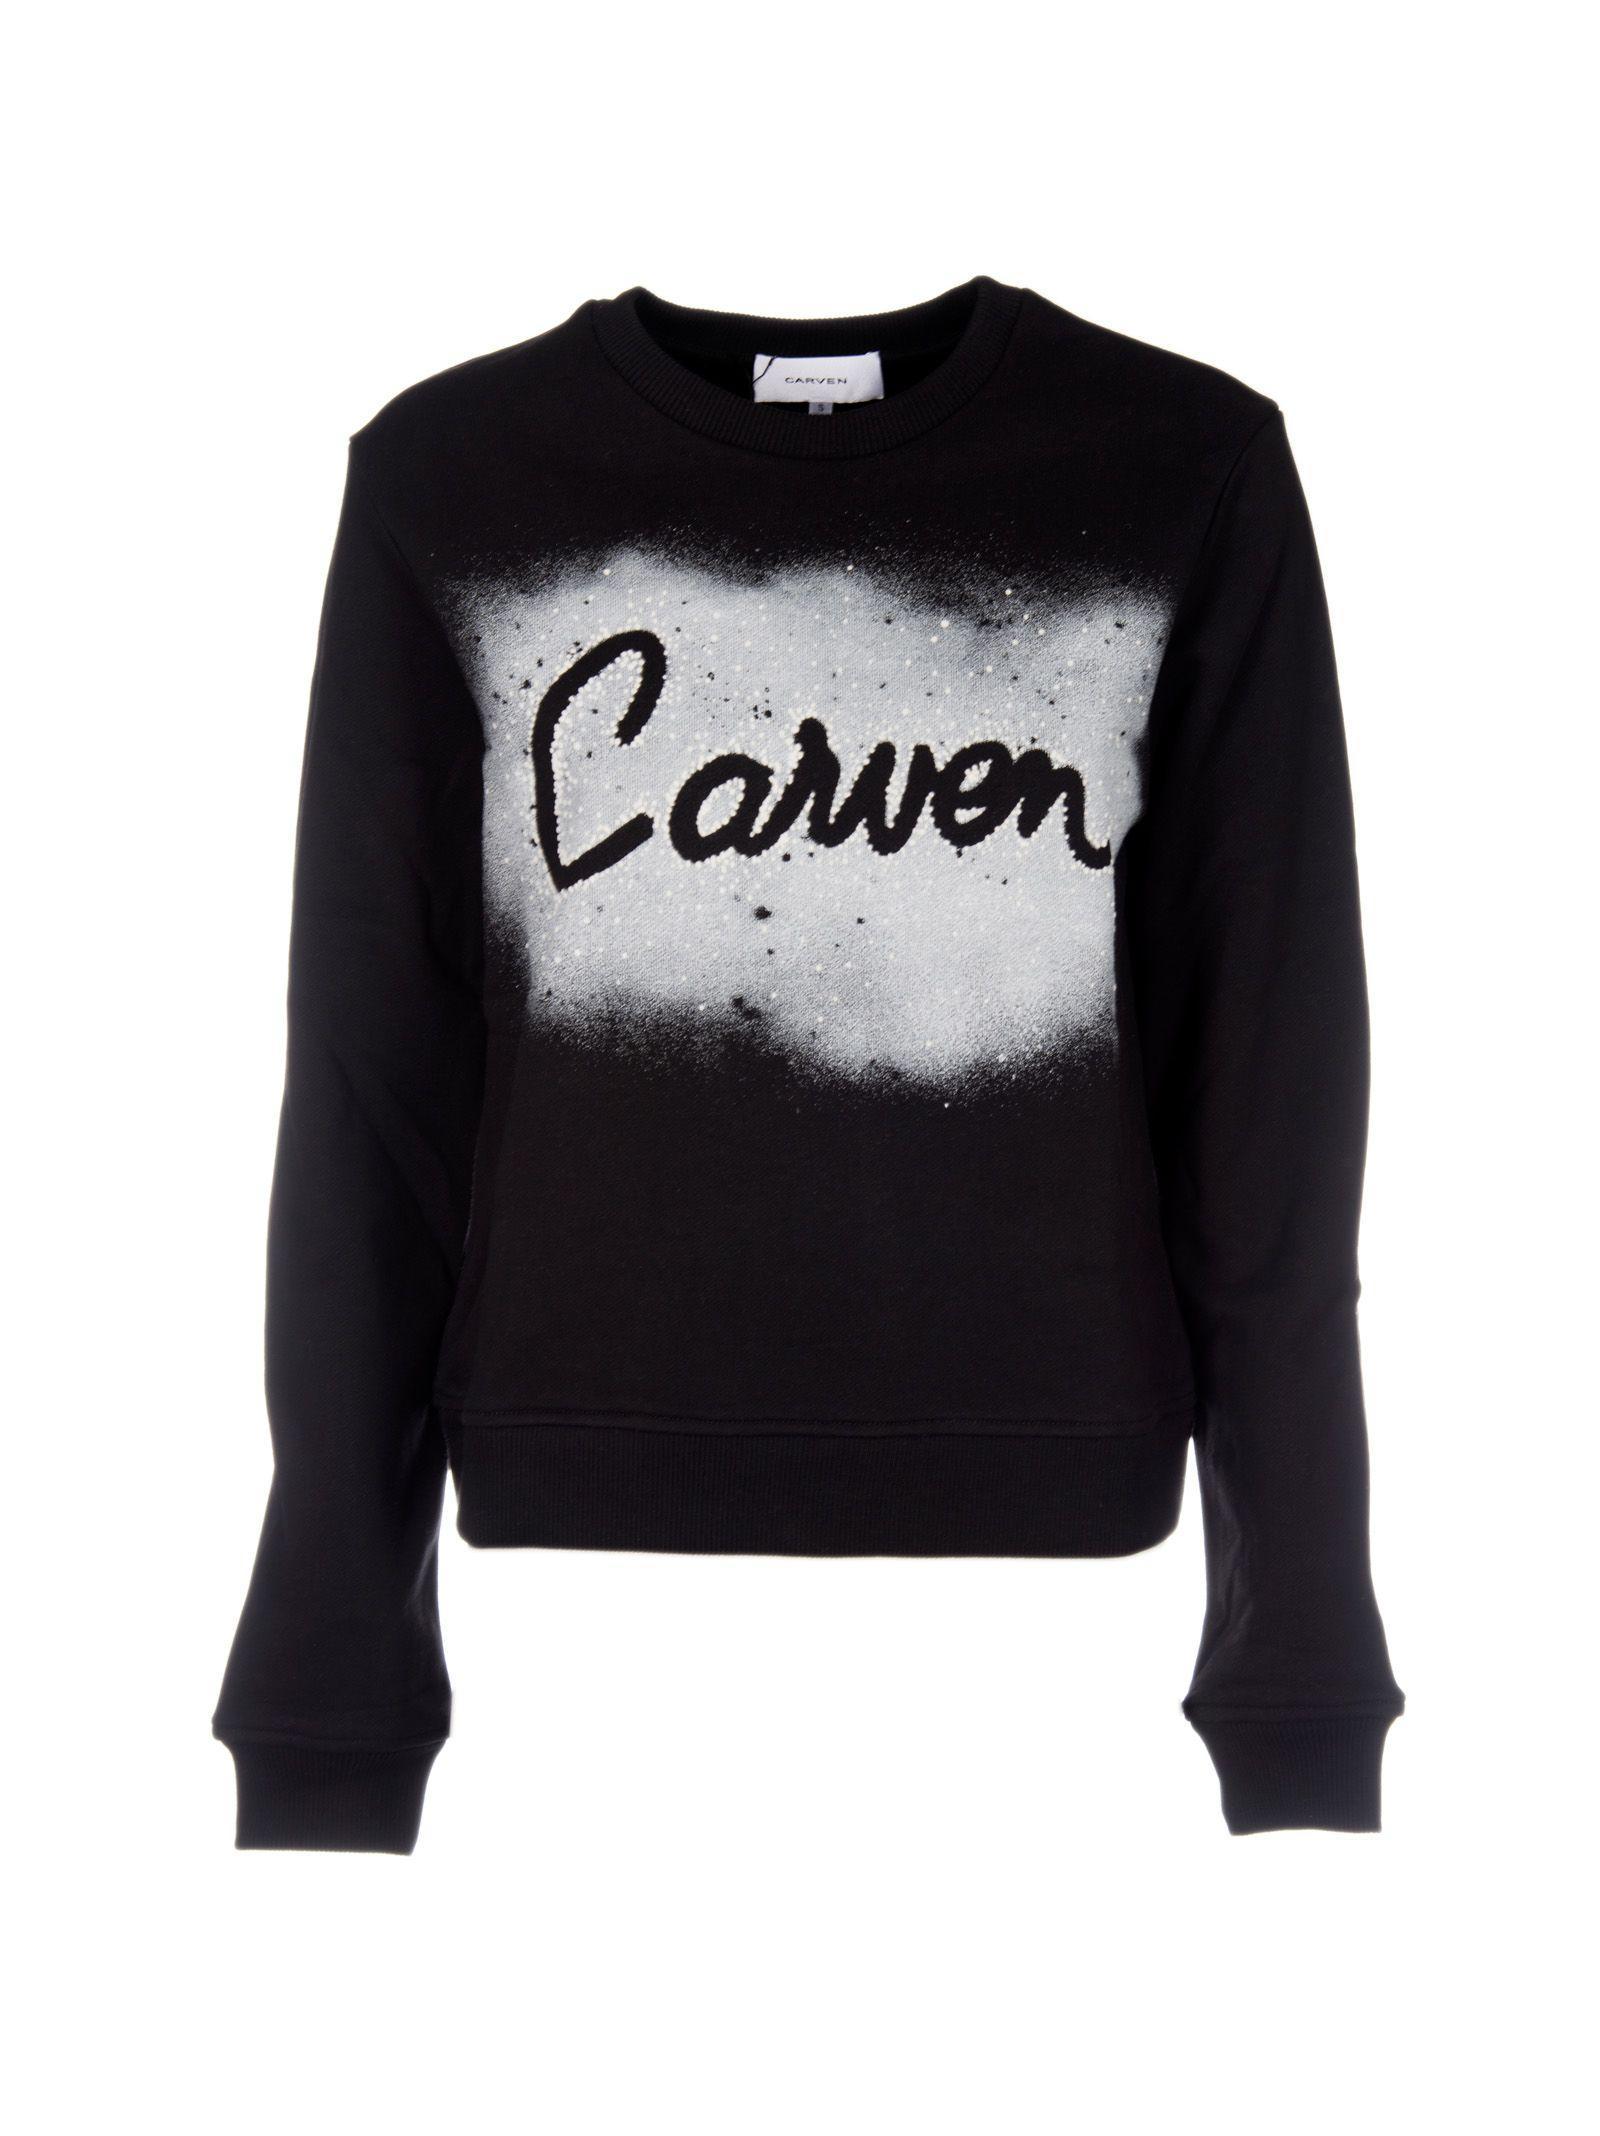 Carven Spray Print Logo Sweatshirt In Black